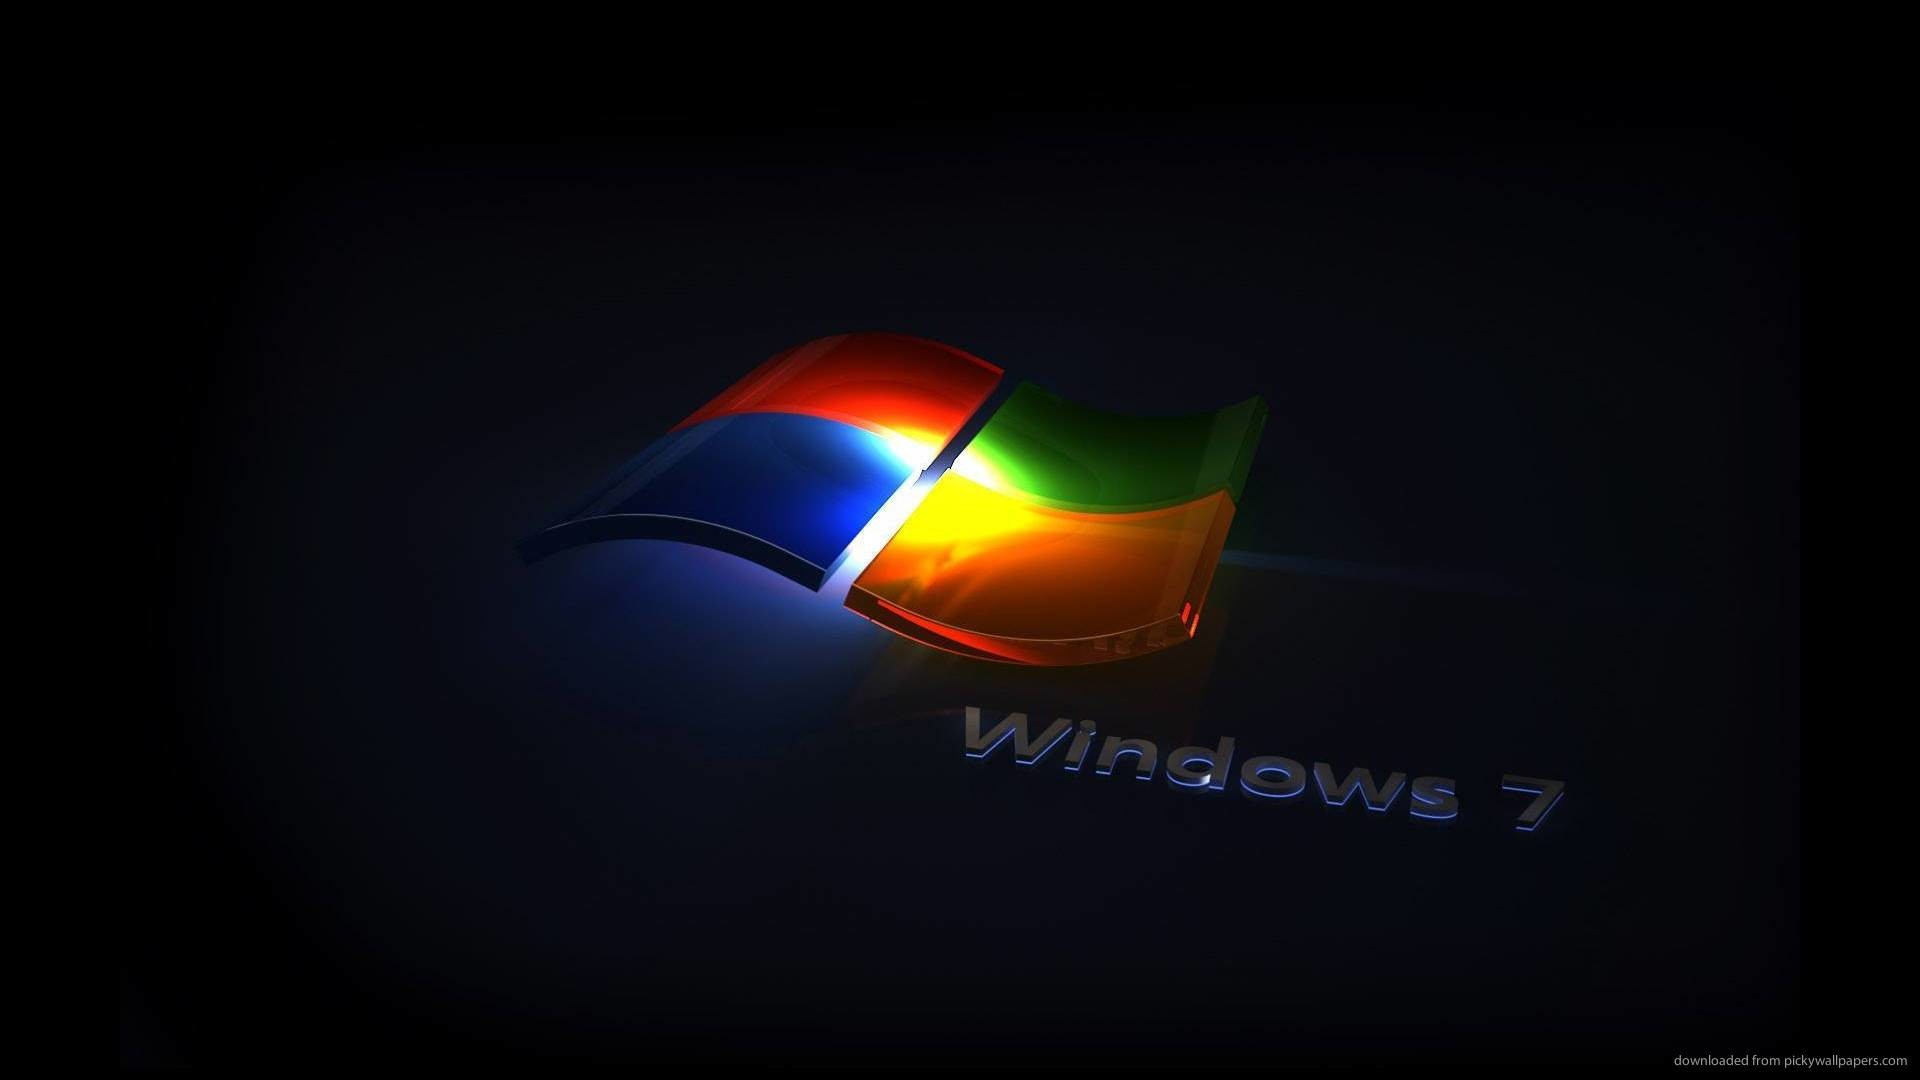 Windows 7 Wallpaper Hd wallpaper – 565143